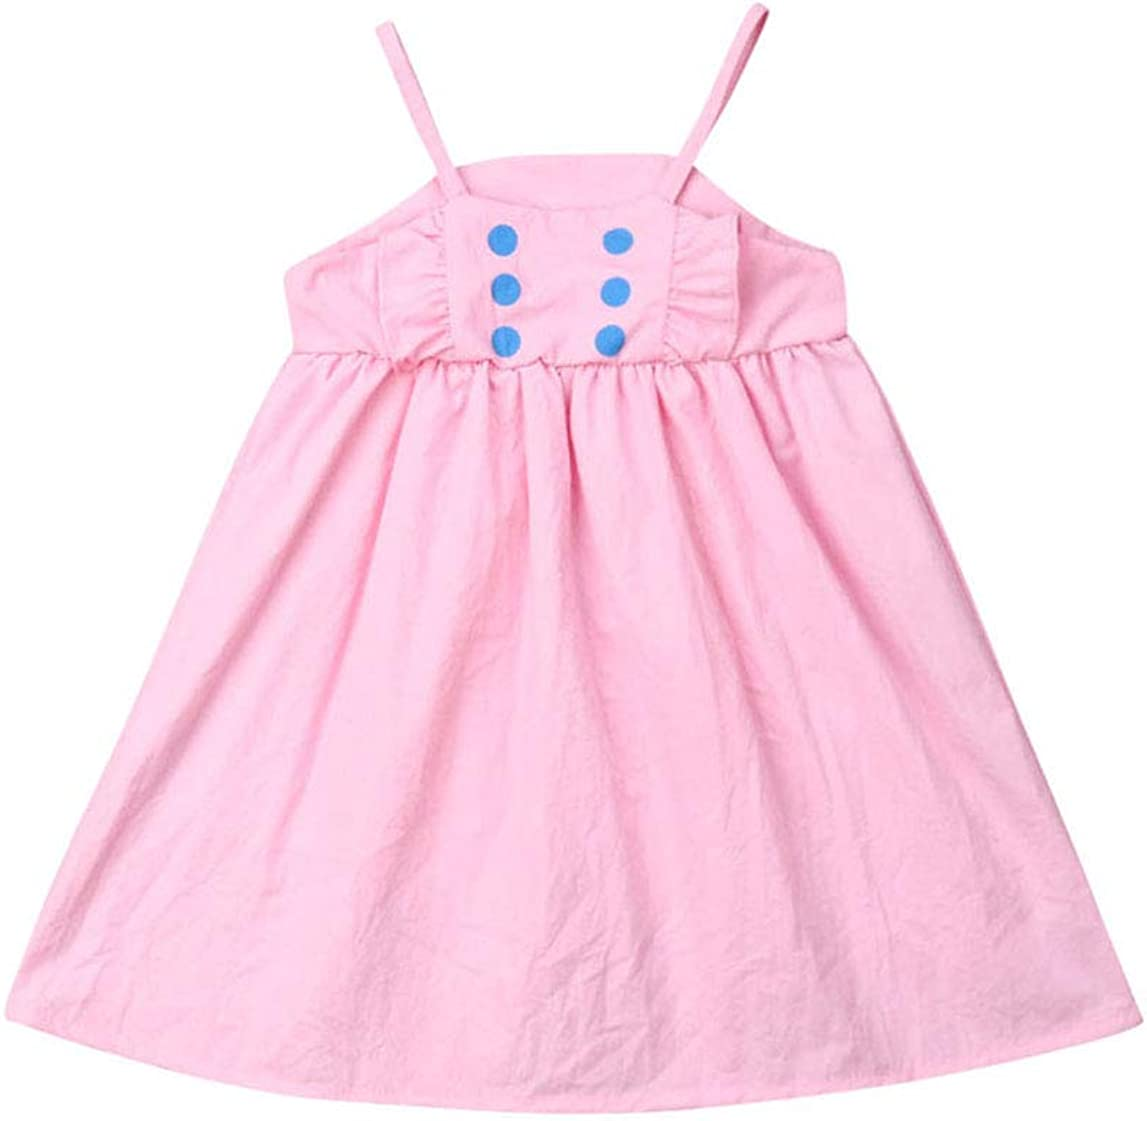 Toddler Kid Baby Girl Summer Sleeveless Spaghetti Straps Rainbow Striped Dress